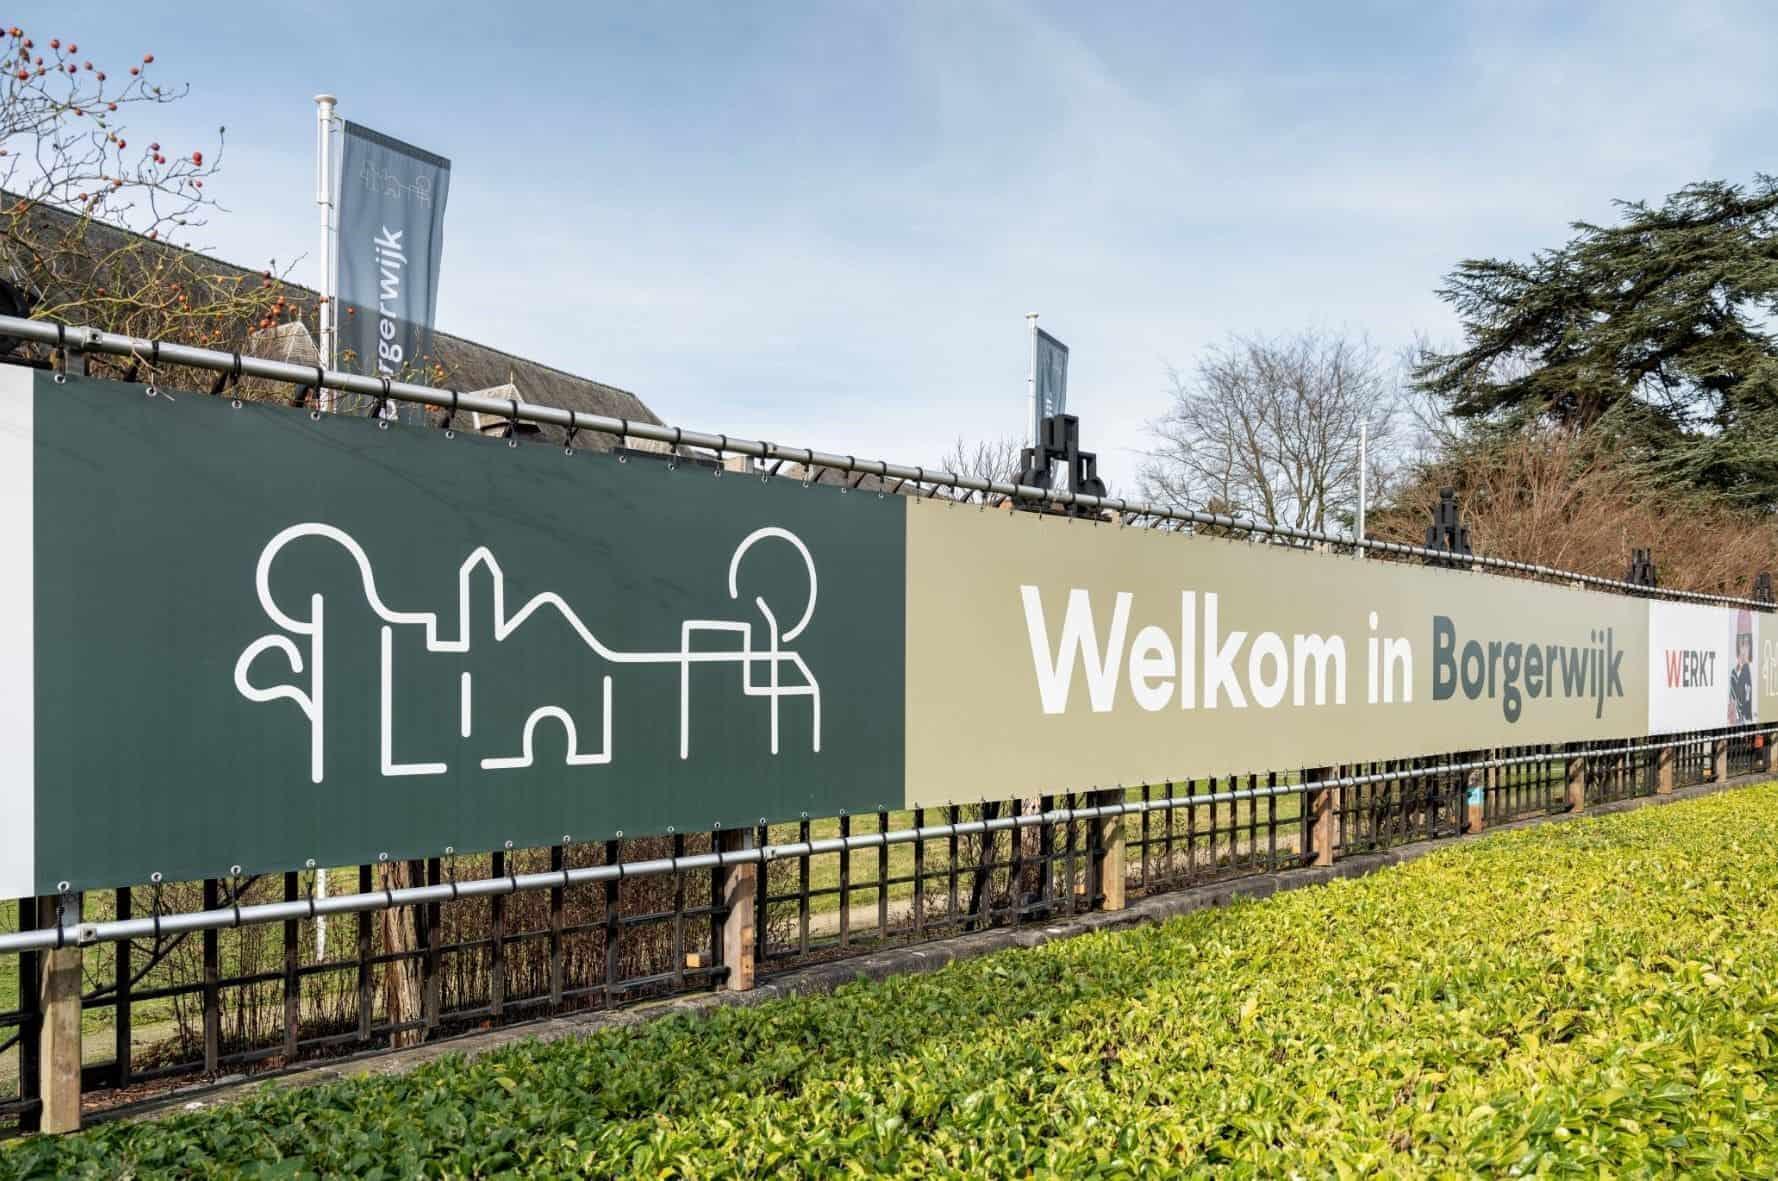 Community engagement Borgerwijk